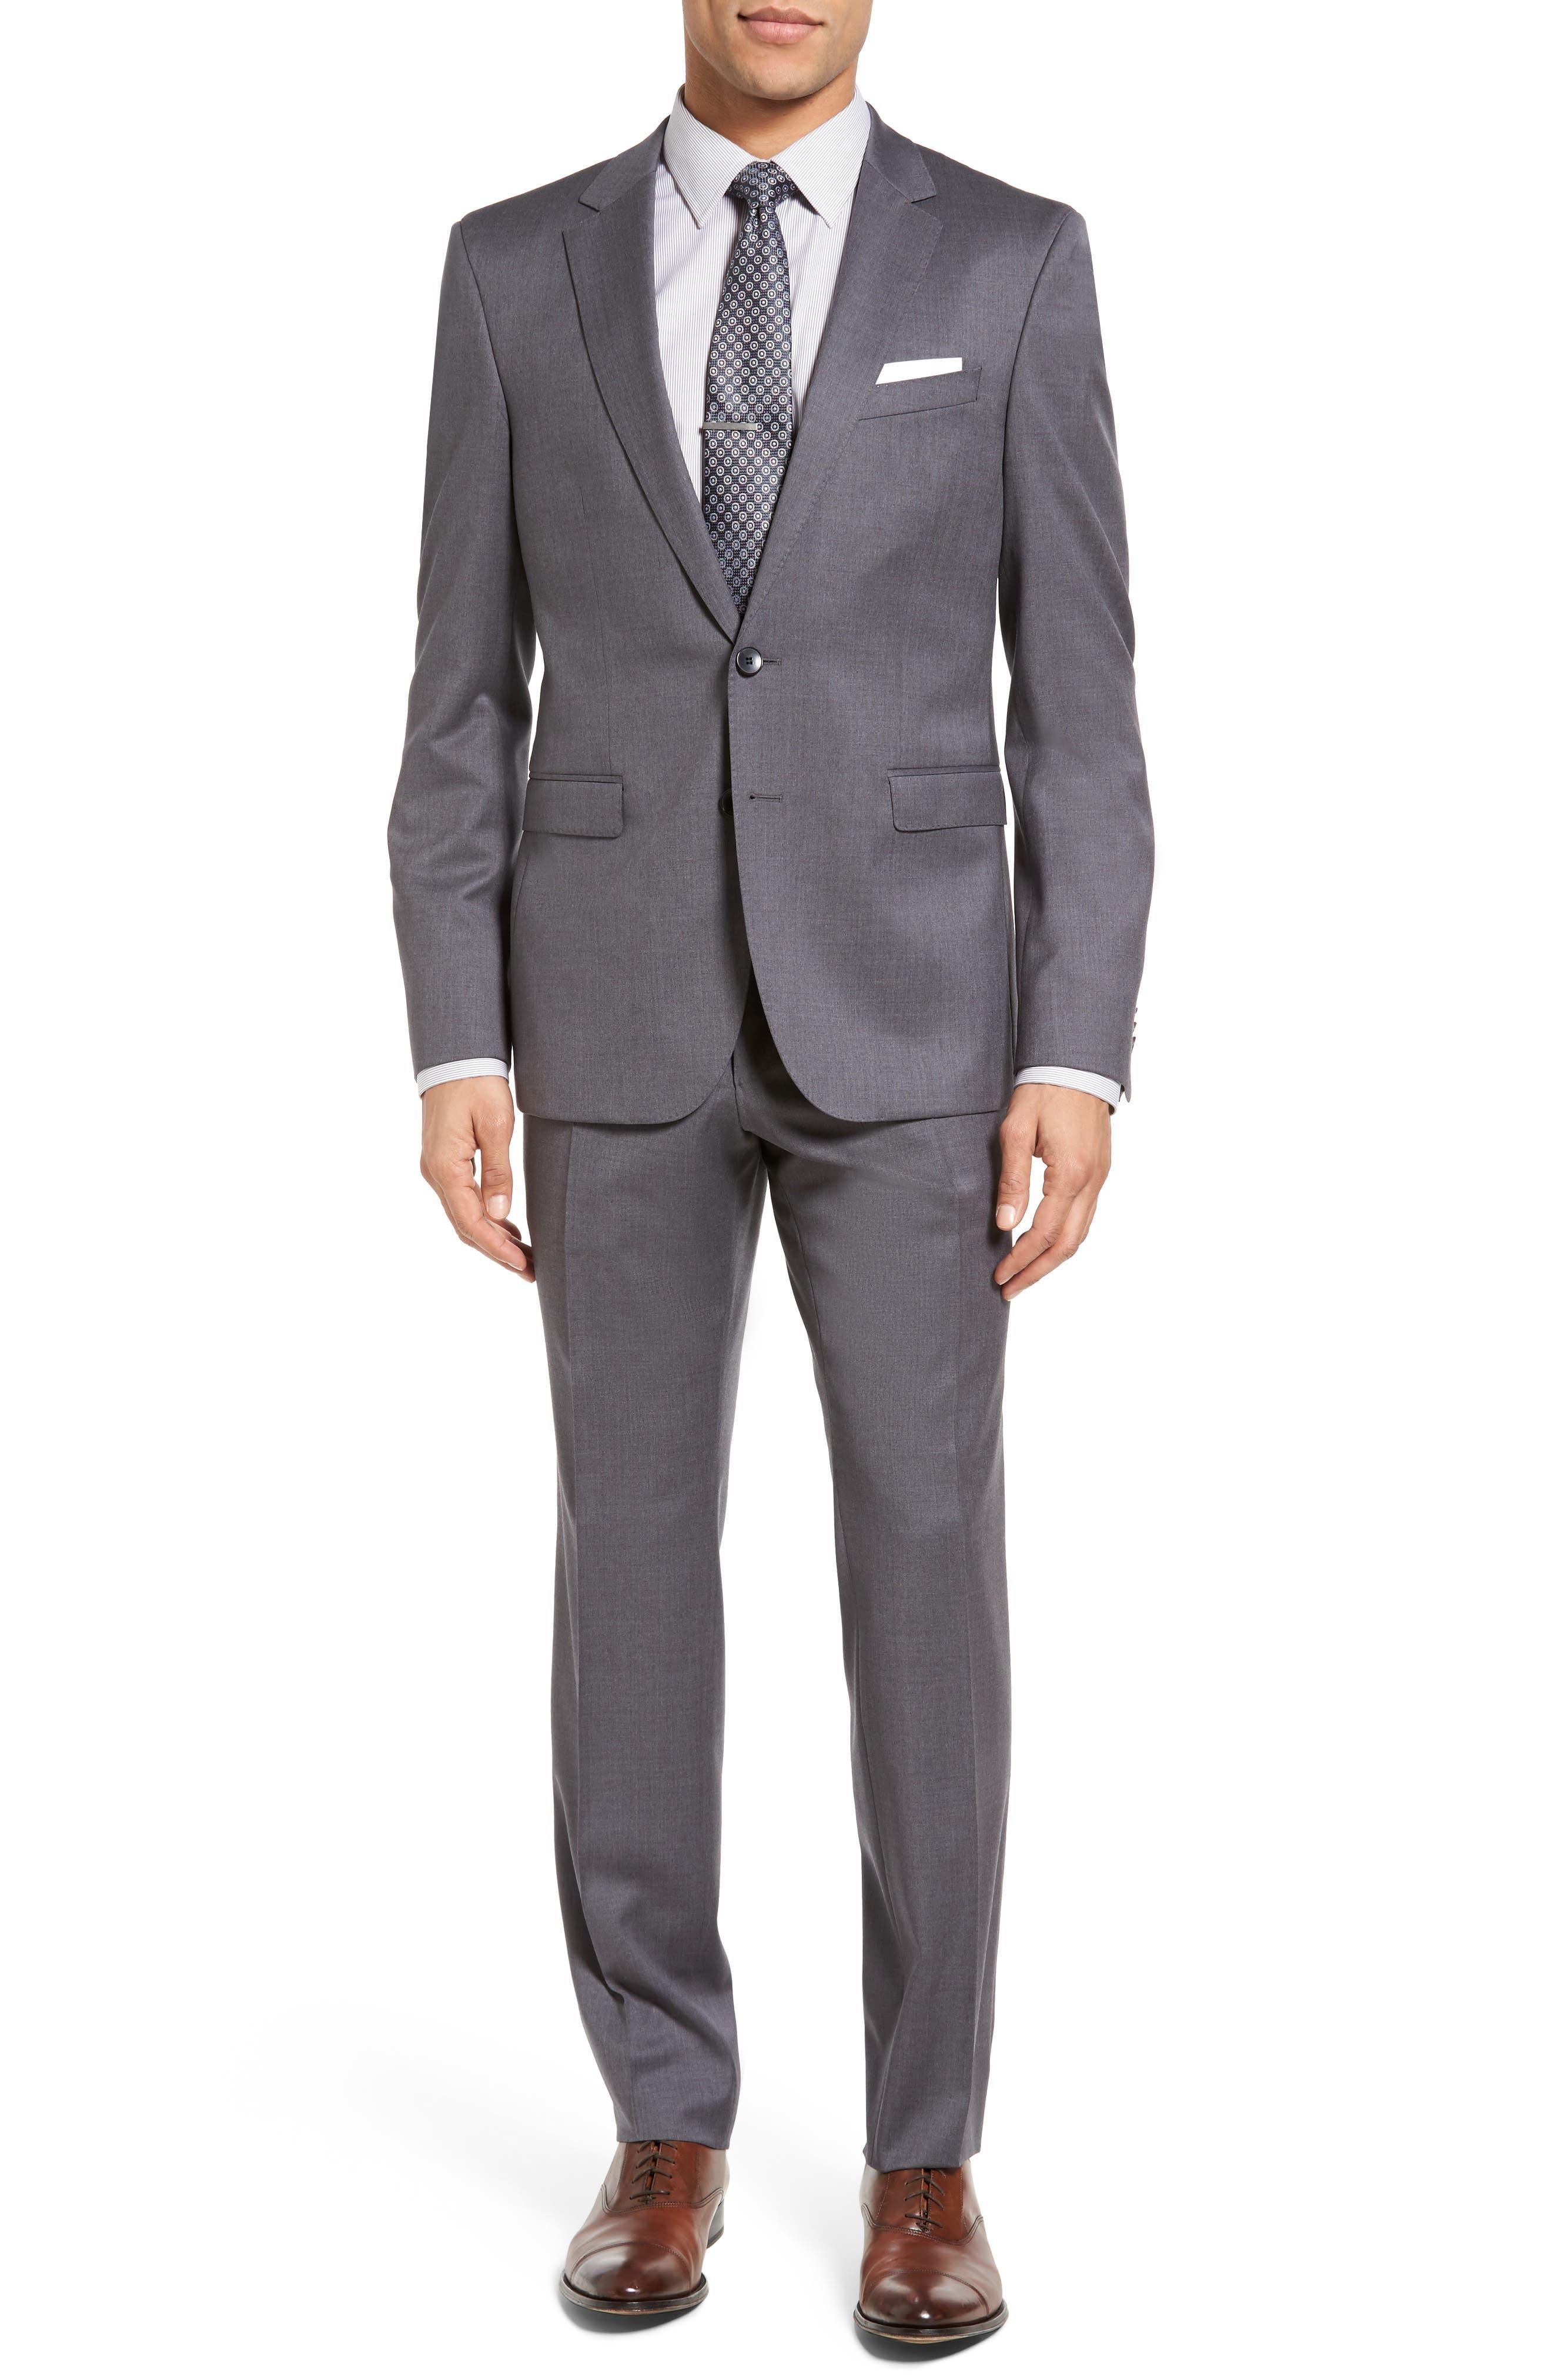 BOSS Ryan/Win Trim Fit Solid Wool Suit